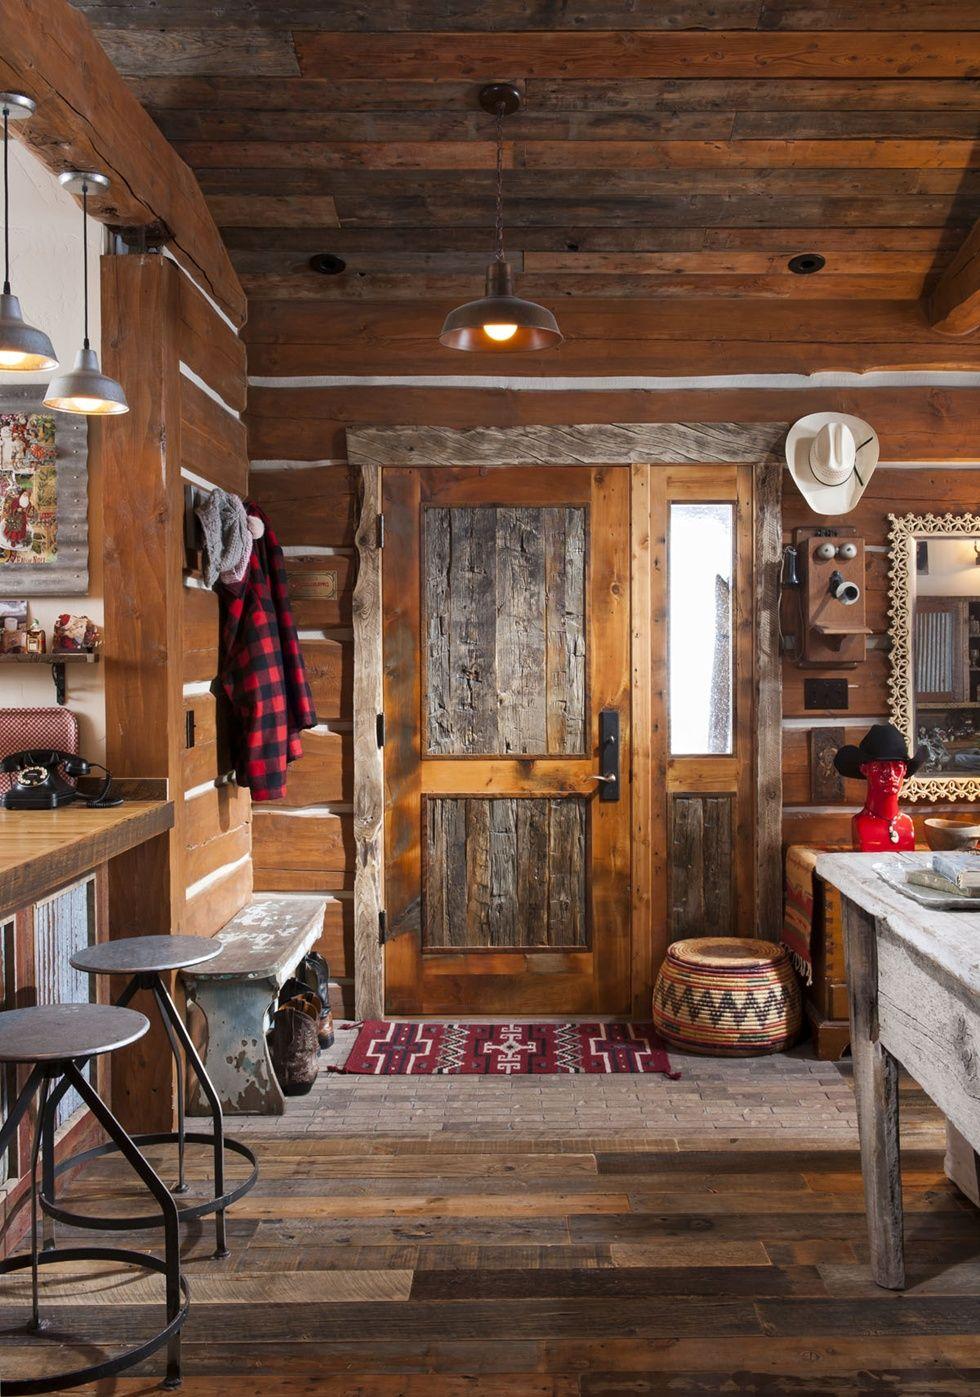 "30 Rustic Chalet Interior Design Ideas: Bonus Photos & Floor Plans For ""A Boyhood Dream Comes True"" - Cabin Life Magazine"